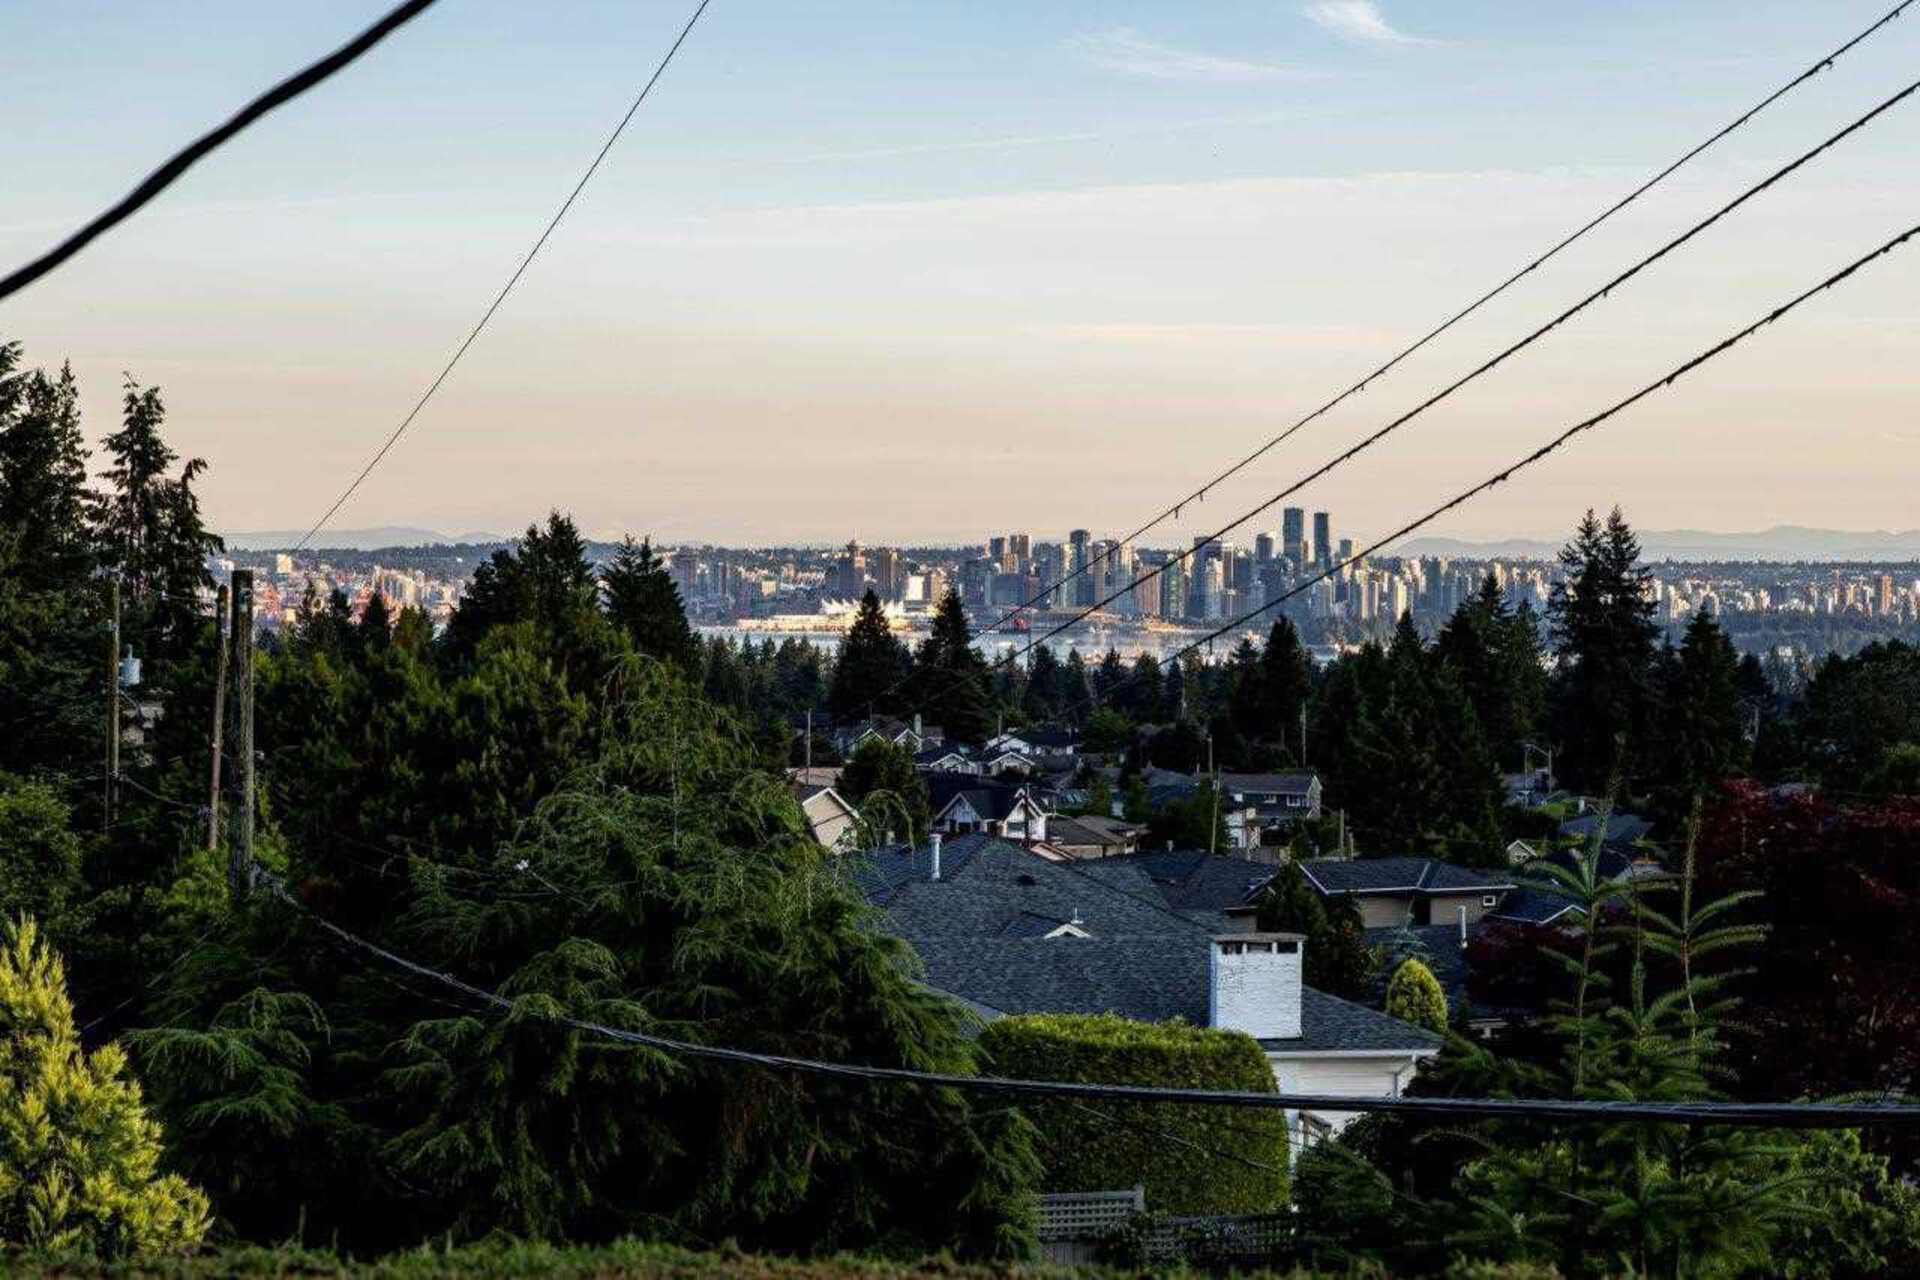 4367-ranger-avenue-forest-hills-nv-north-vancouver-27 at 4367 Ranger Avenue, Forest Hills NV, North Vancouver